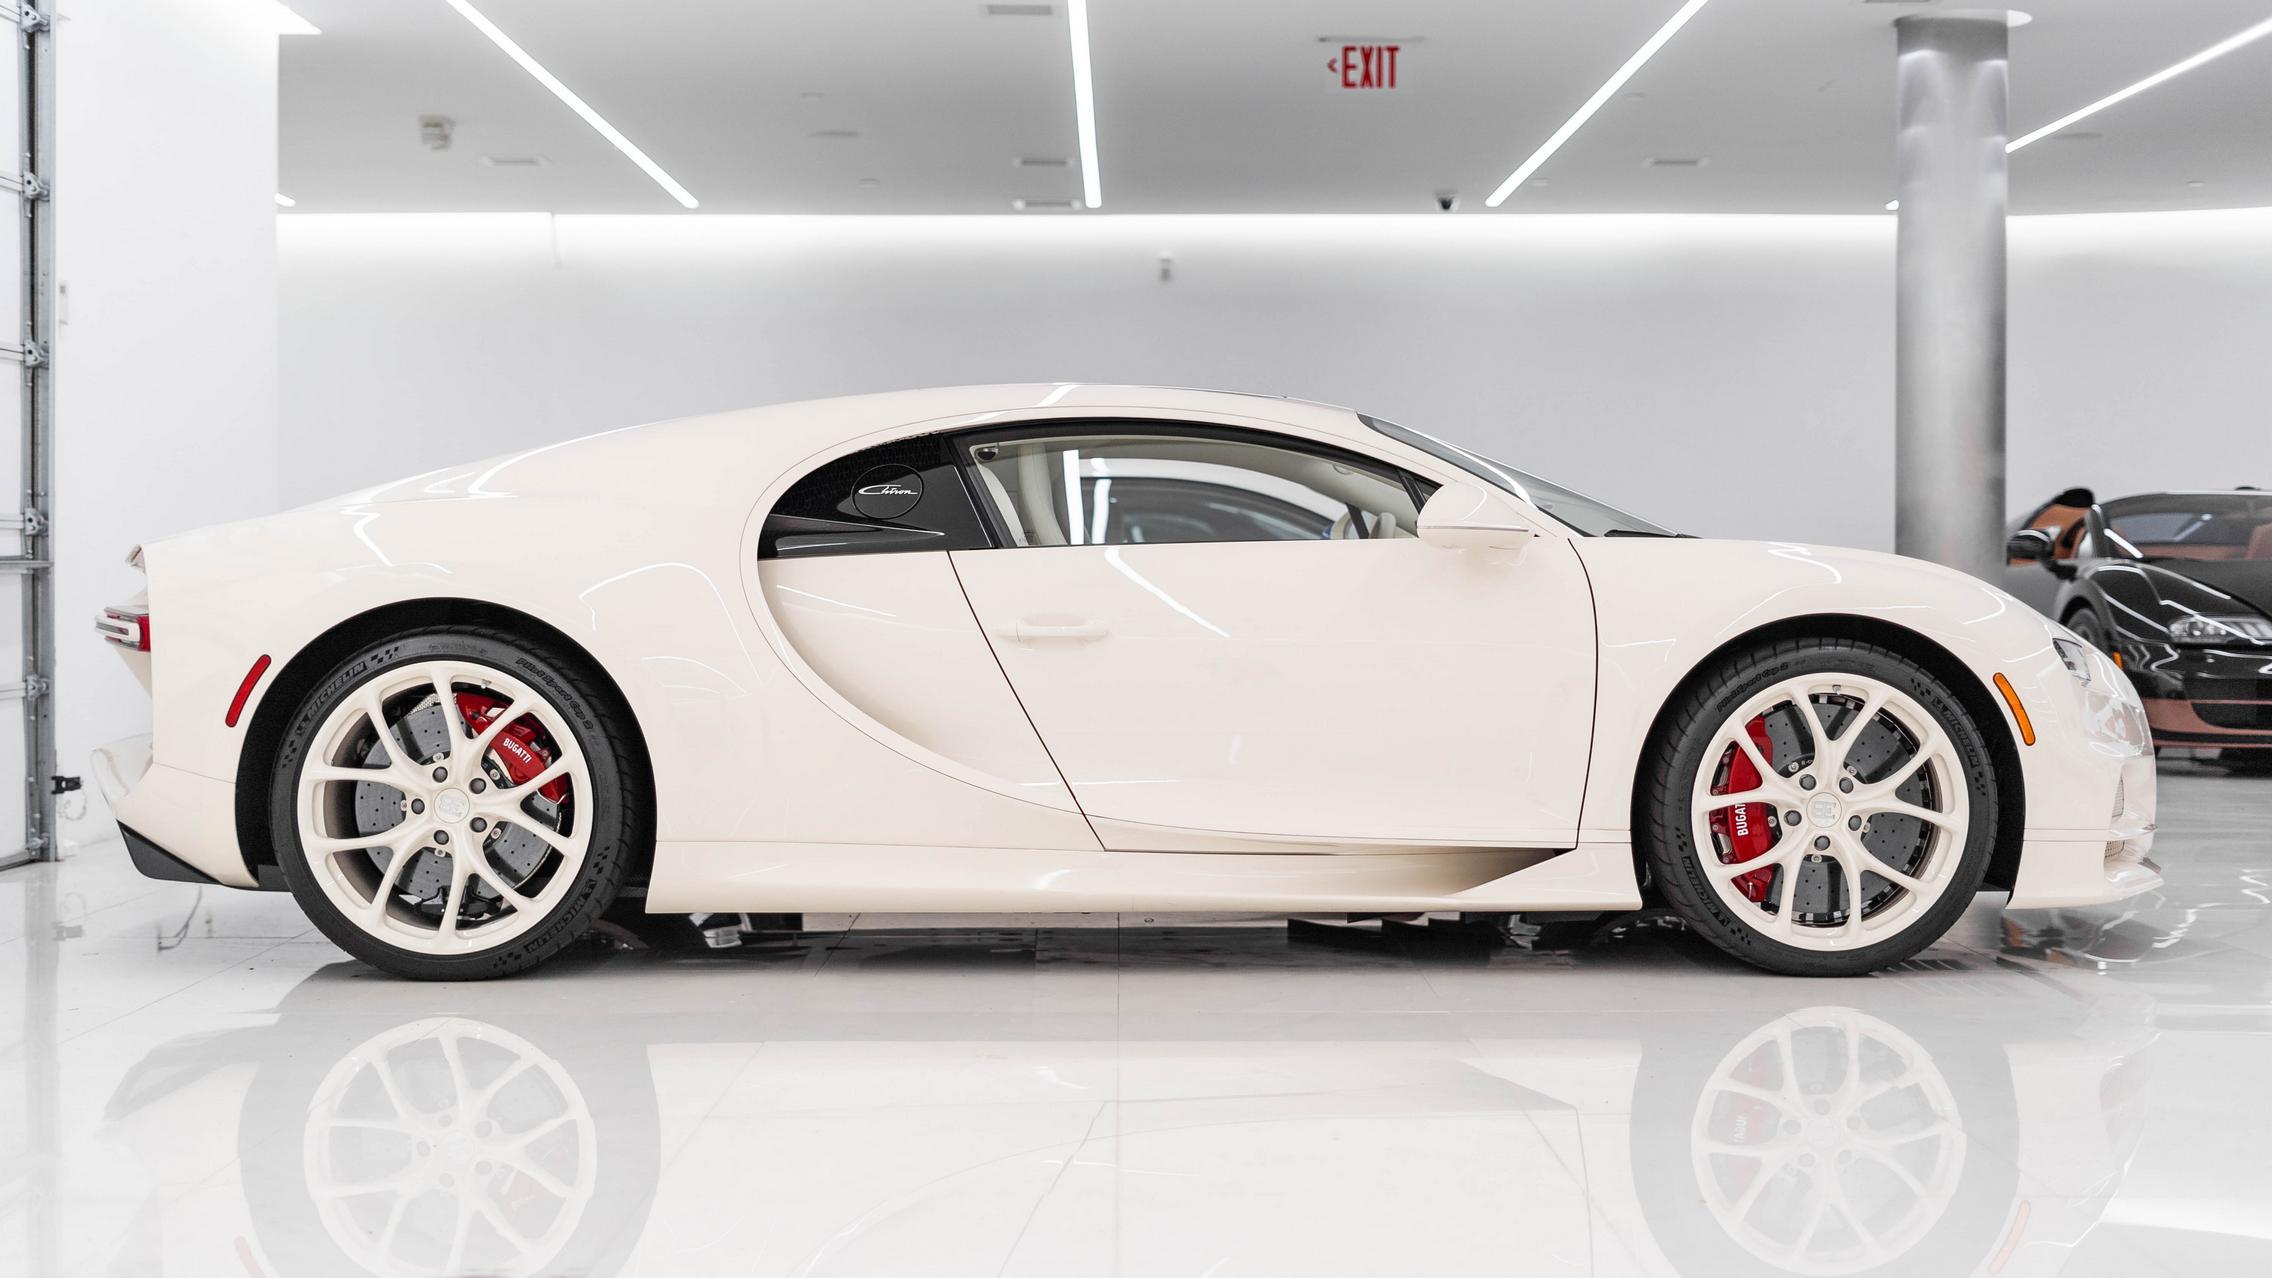 Hermes Bugatti Chiron side